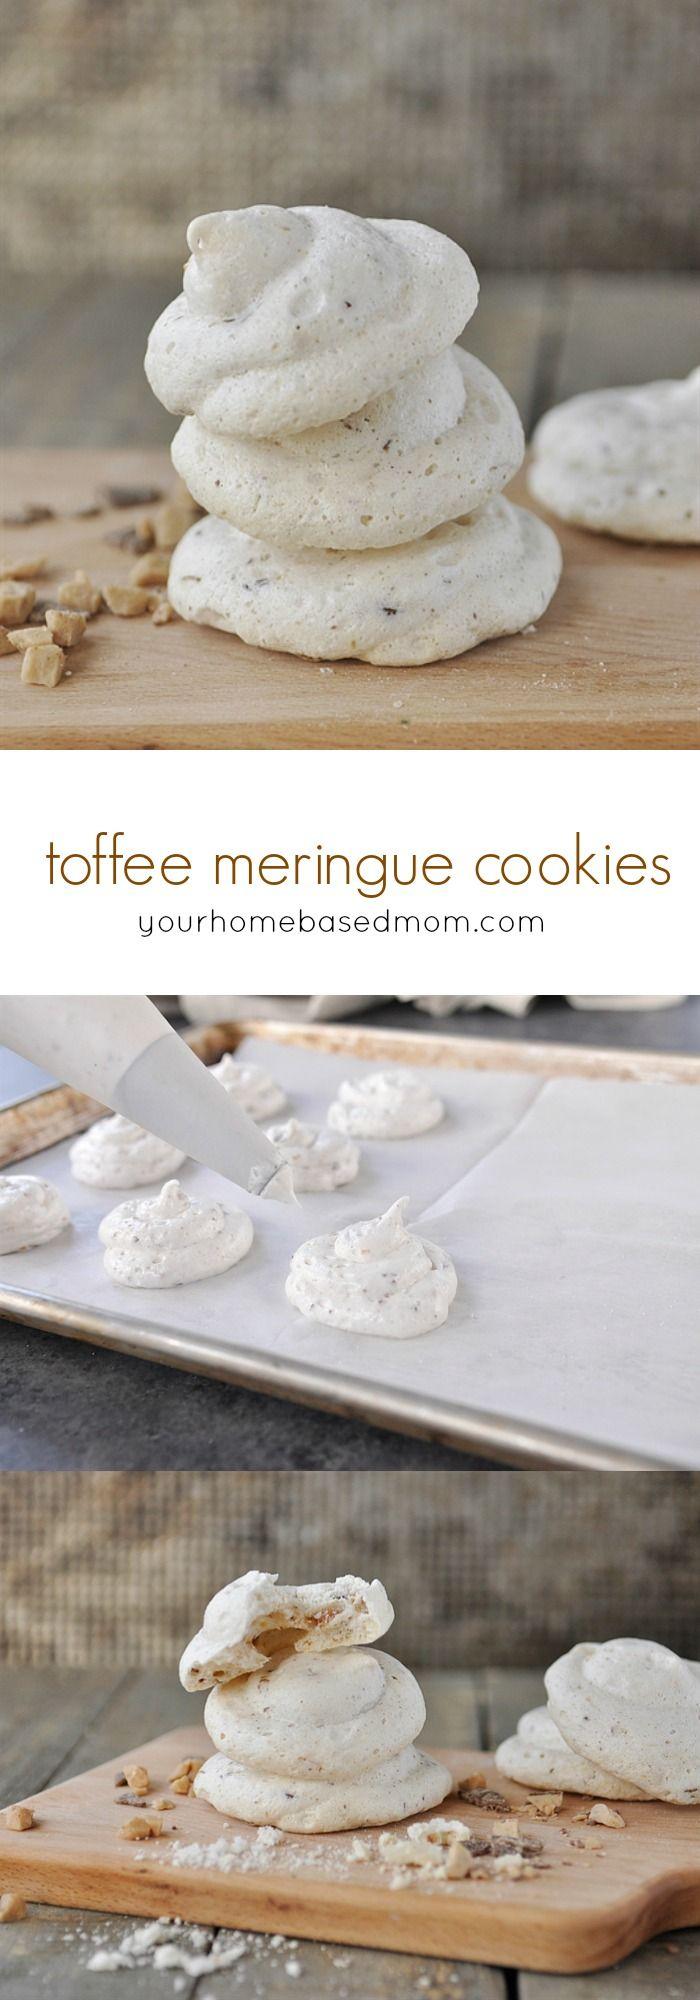 recipe: foolproof meringue cookie recipe [31]